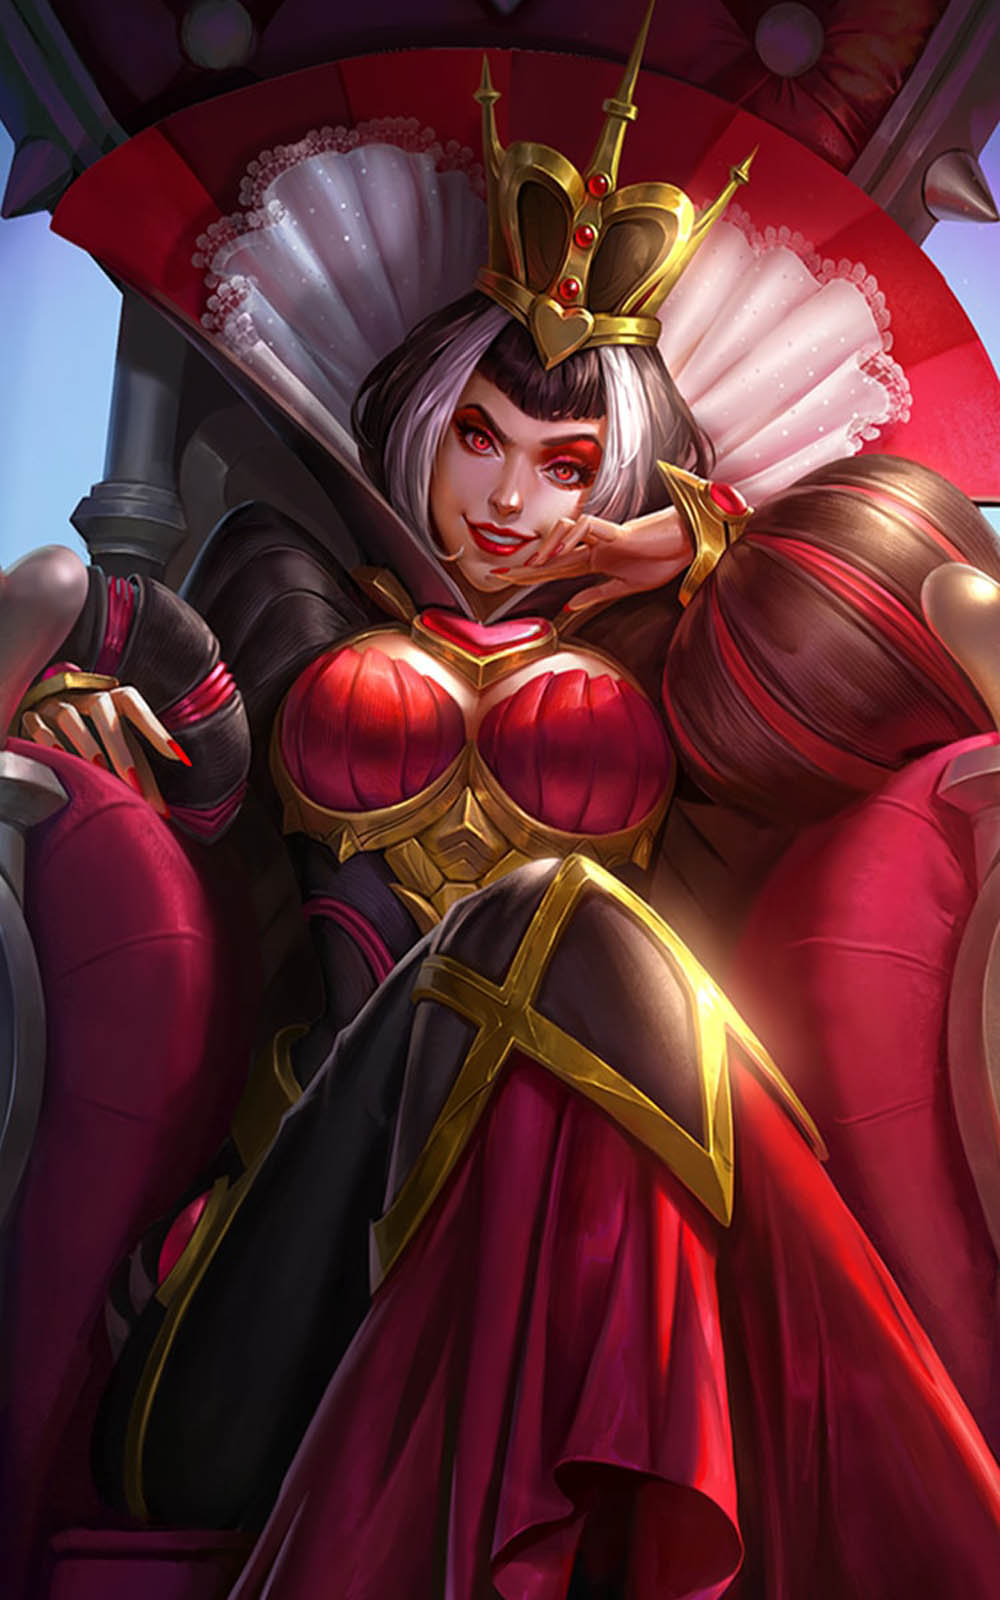 Wallpapers Girls Gamer Download Heartbreak Empress Aurora Mobile Legends Free